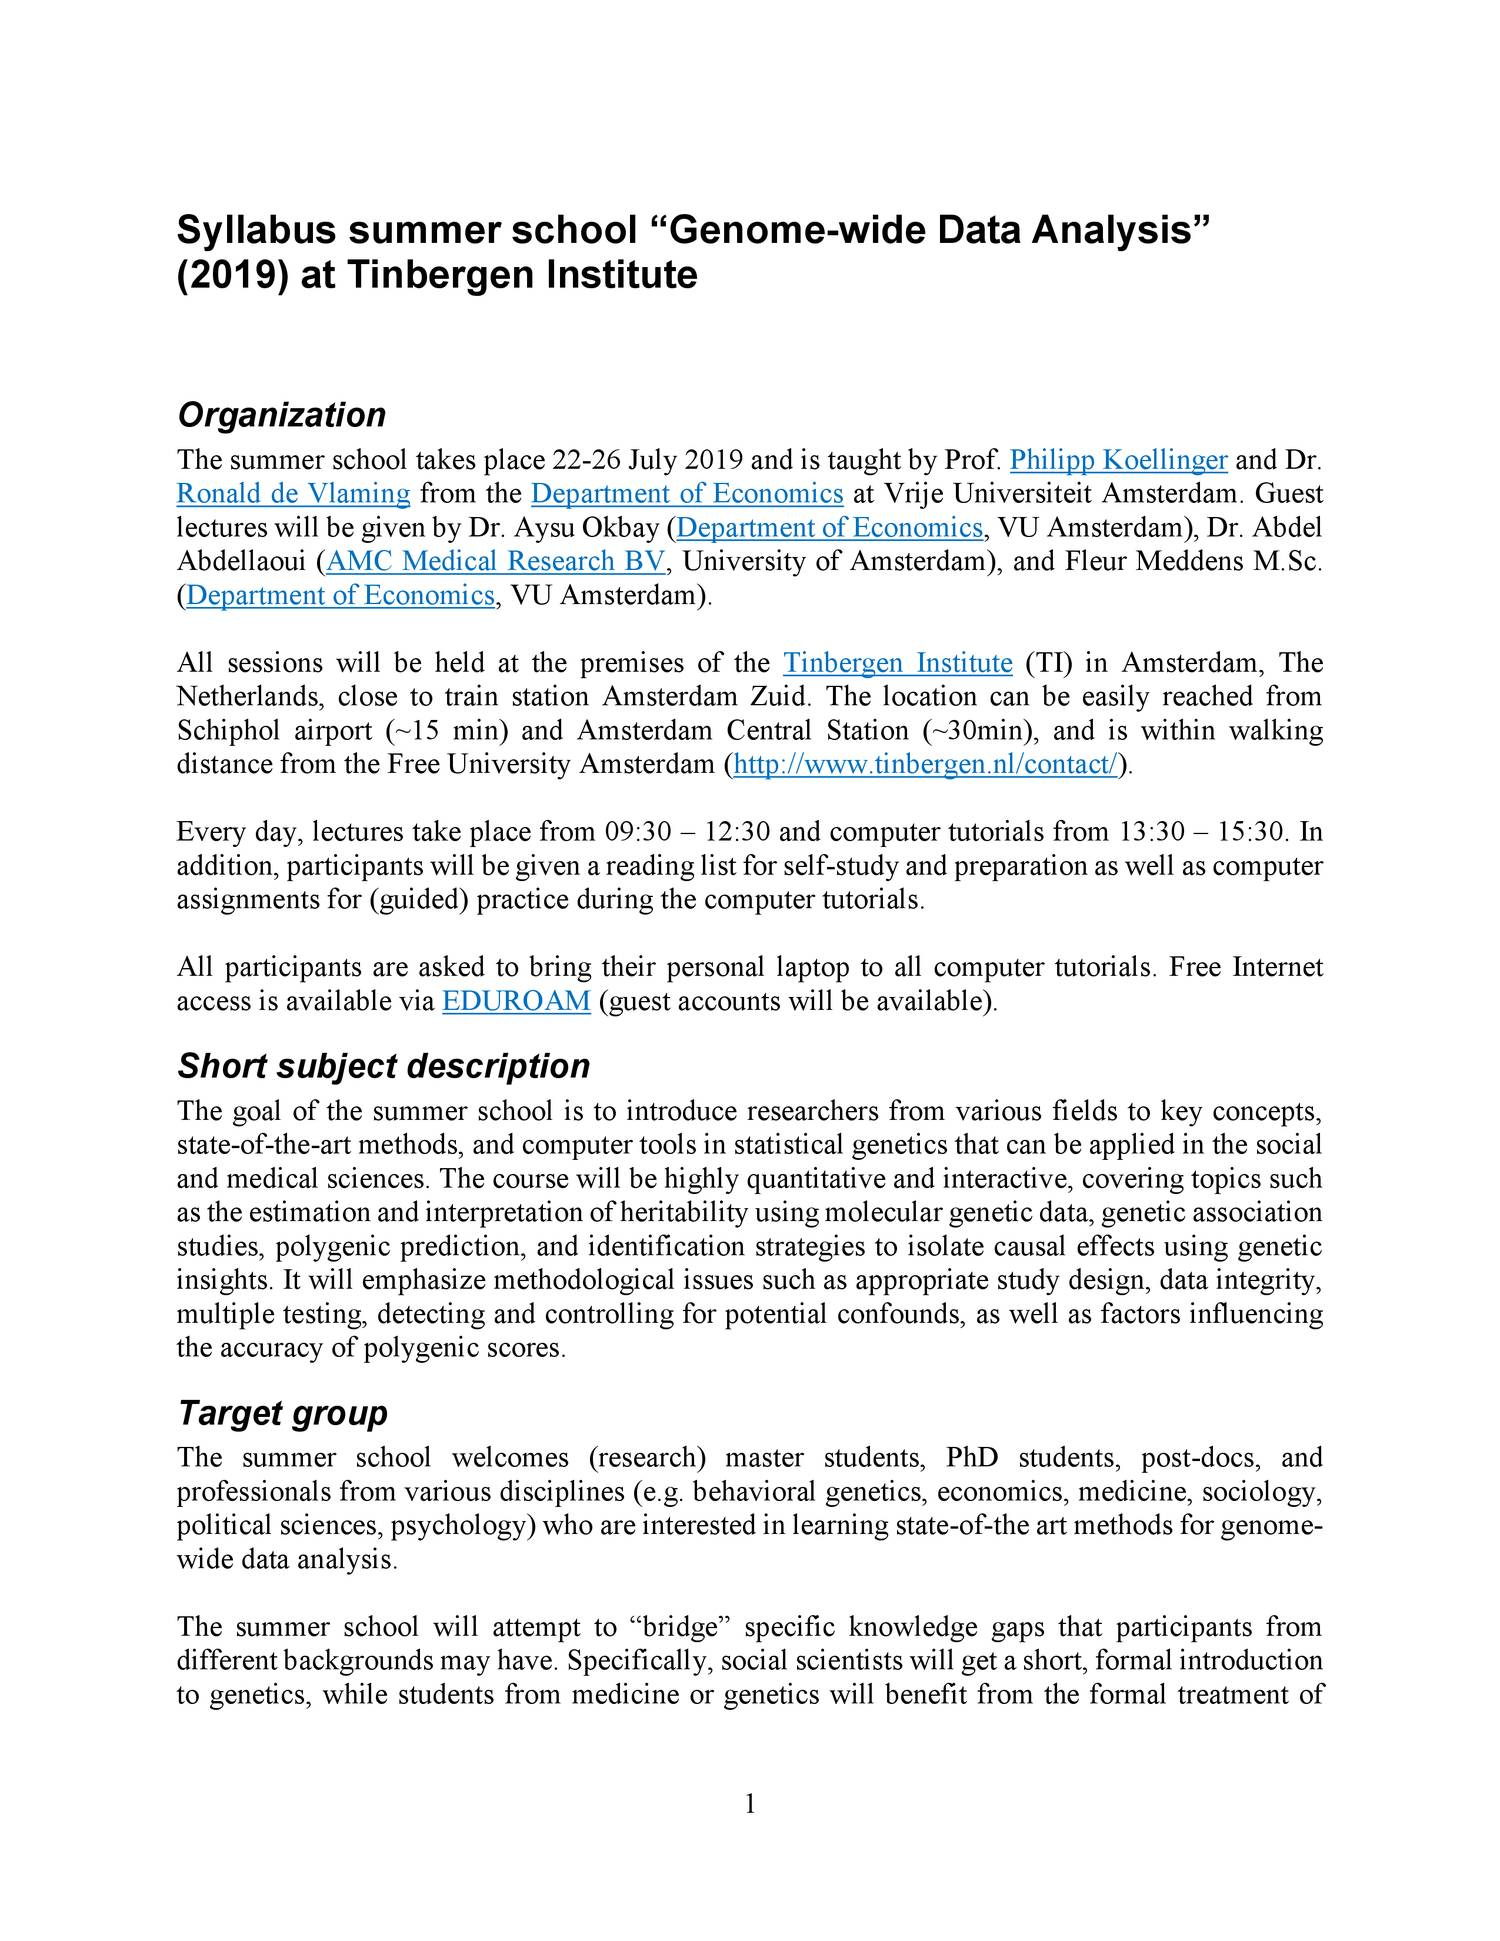 Syllabus Genome-wide Data Analysis 2019 pdf   DocDroid